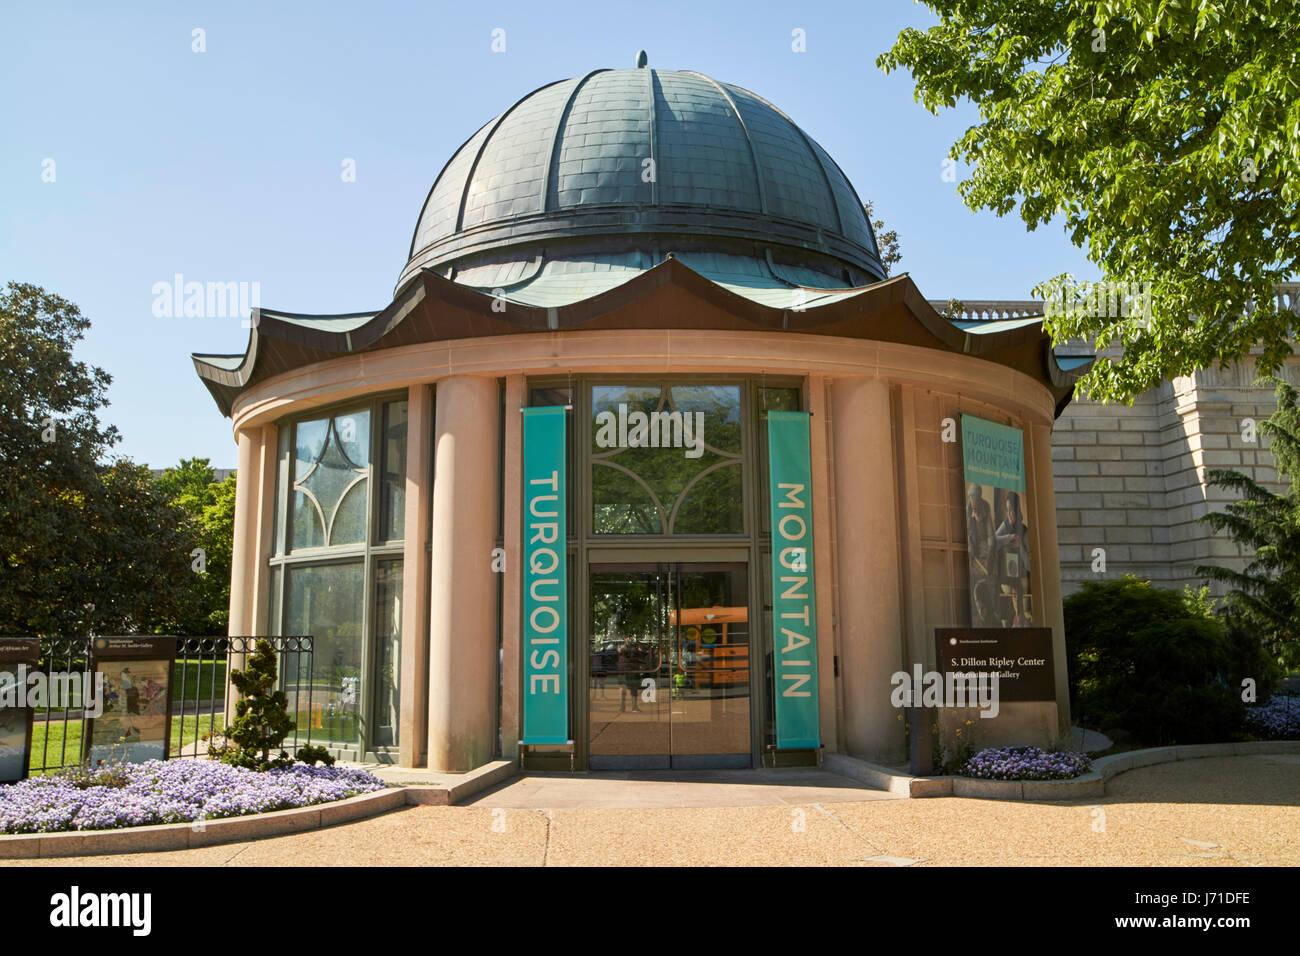 S. Dillon Ripley center international gallery pagoda Washington DC USA Photo Stock